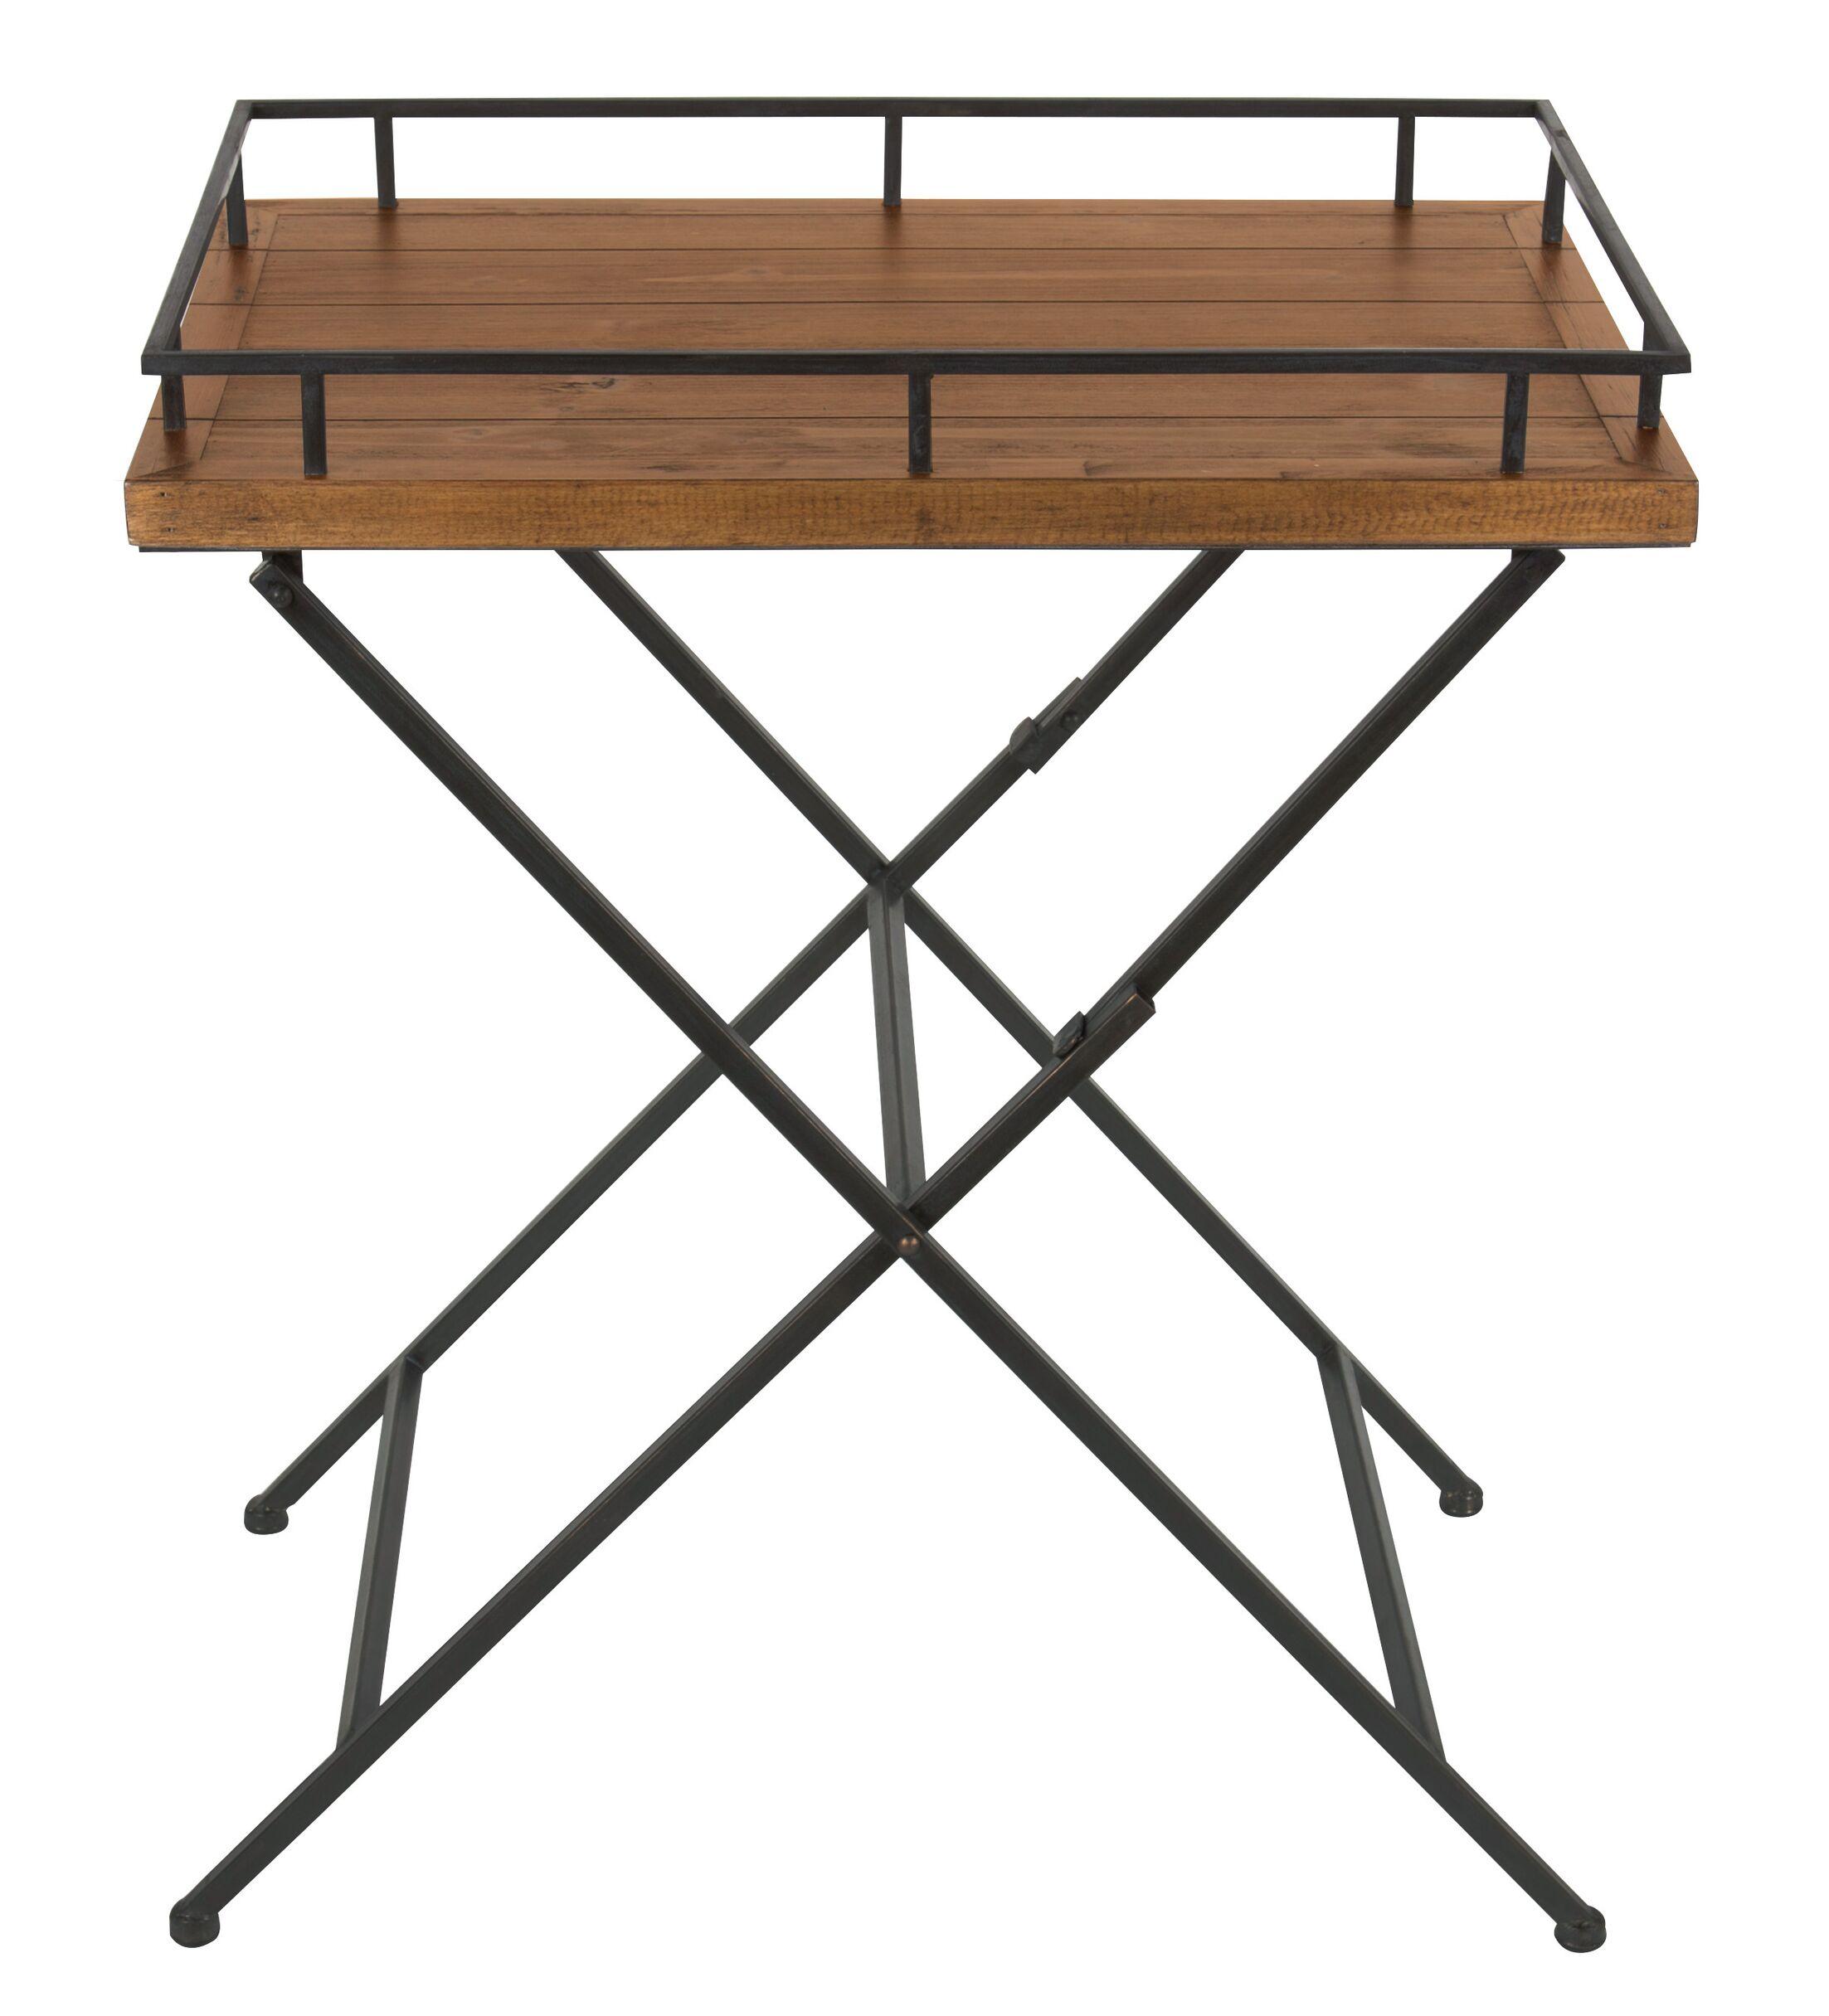 Jordan Wood and Metal Pop up Tray Table